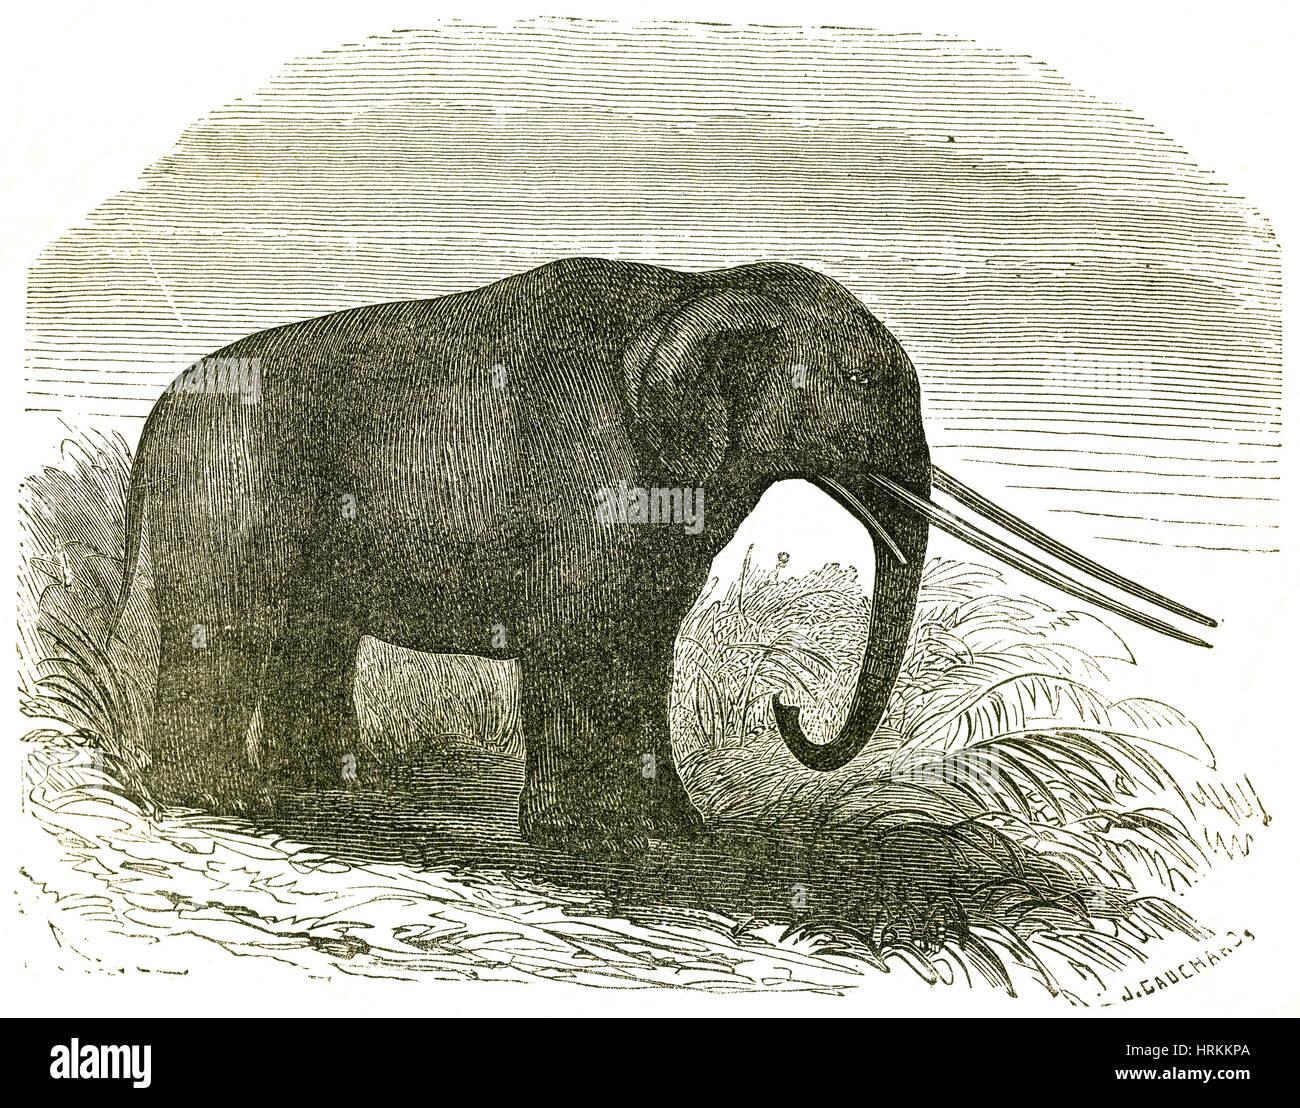 Mastodon - Stock Image